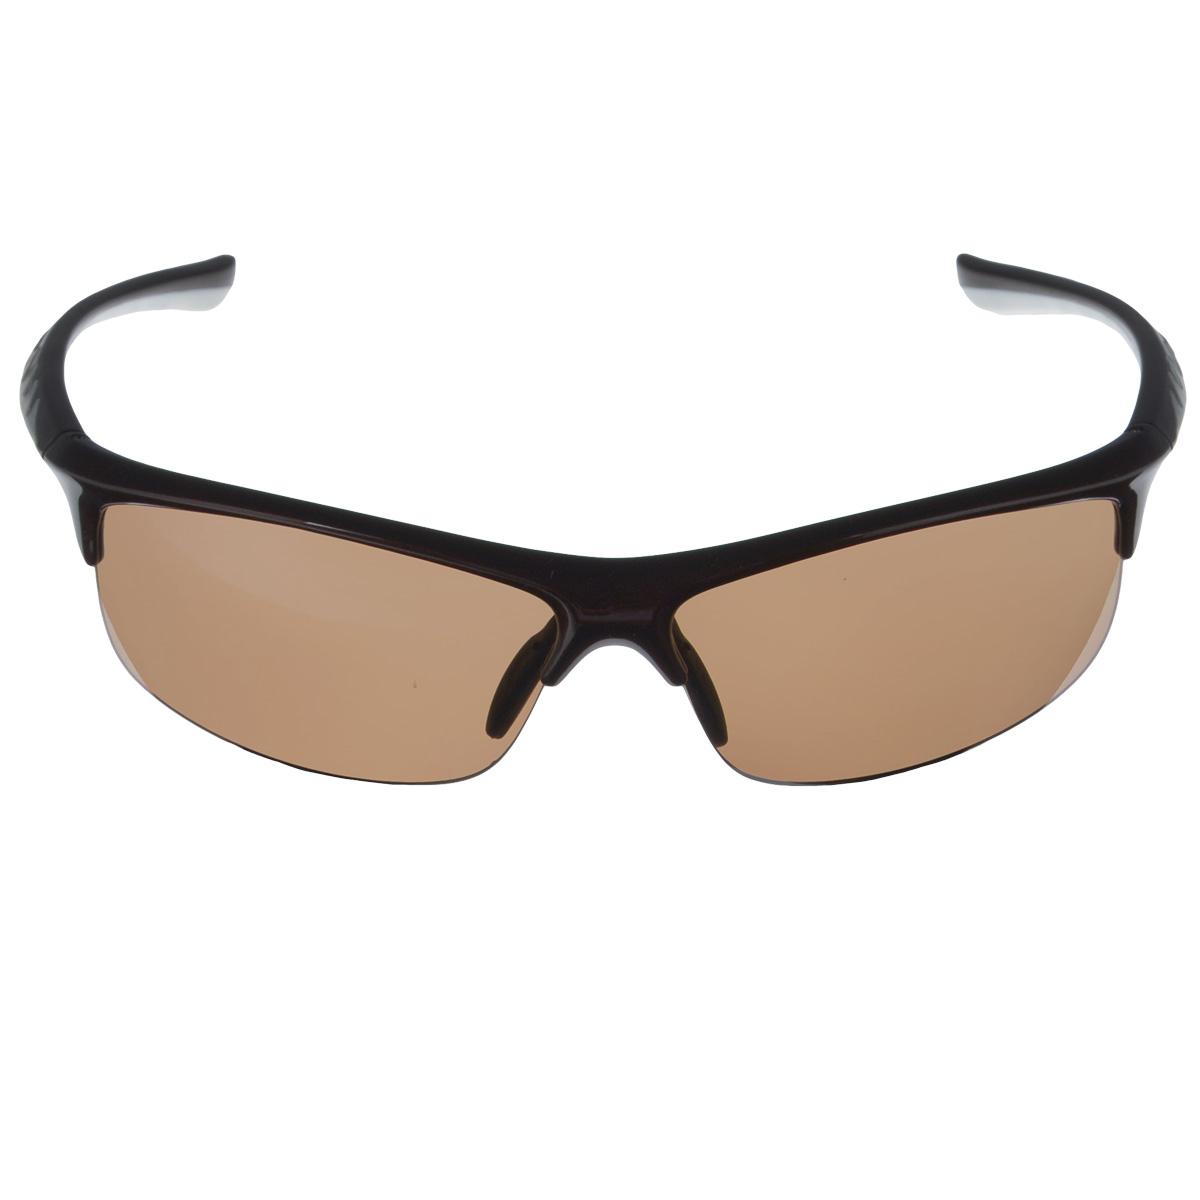 SP Glasses AS021 Premium, Chocolate White водительские очки темные sp glasses ad032 premium dark grey водительские очки